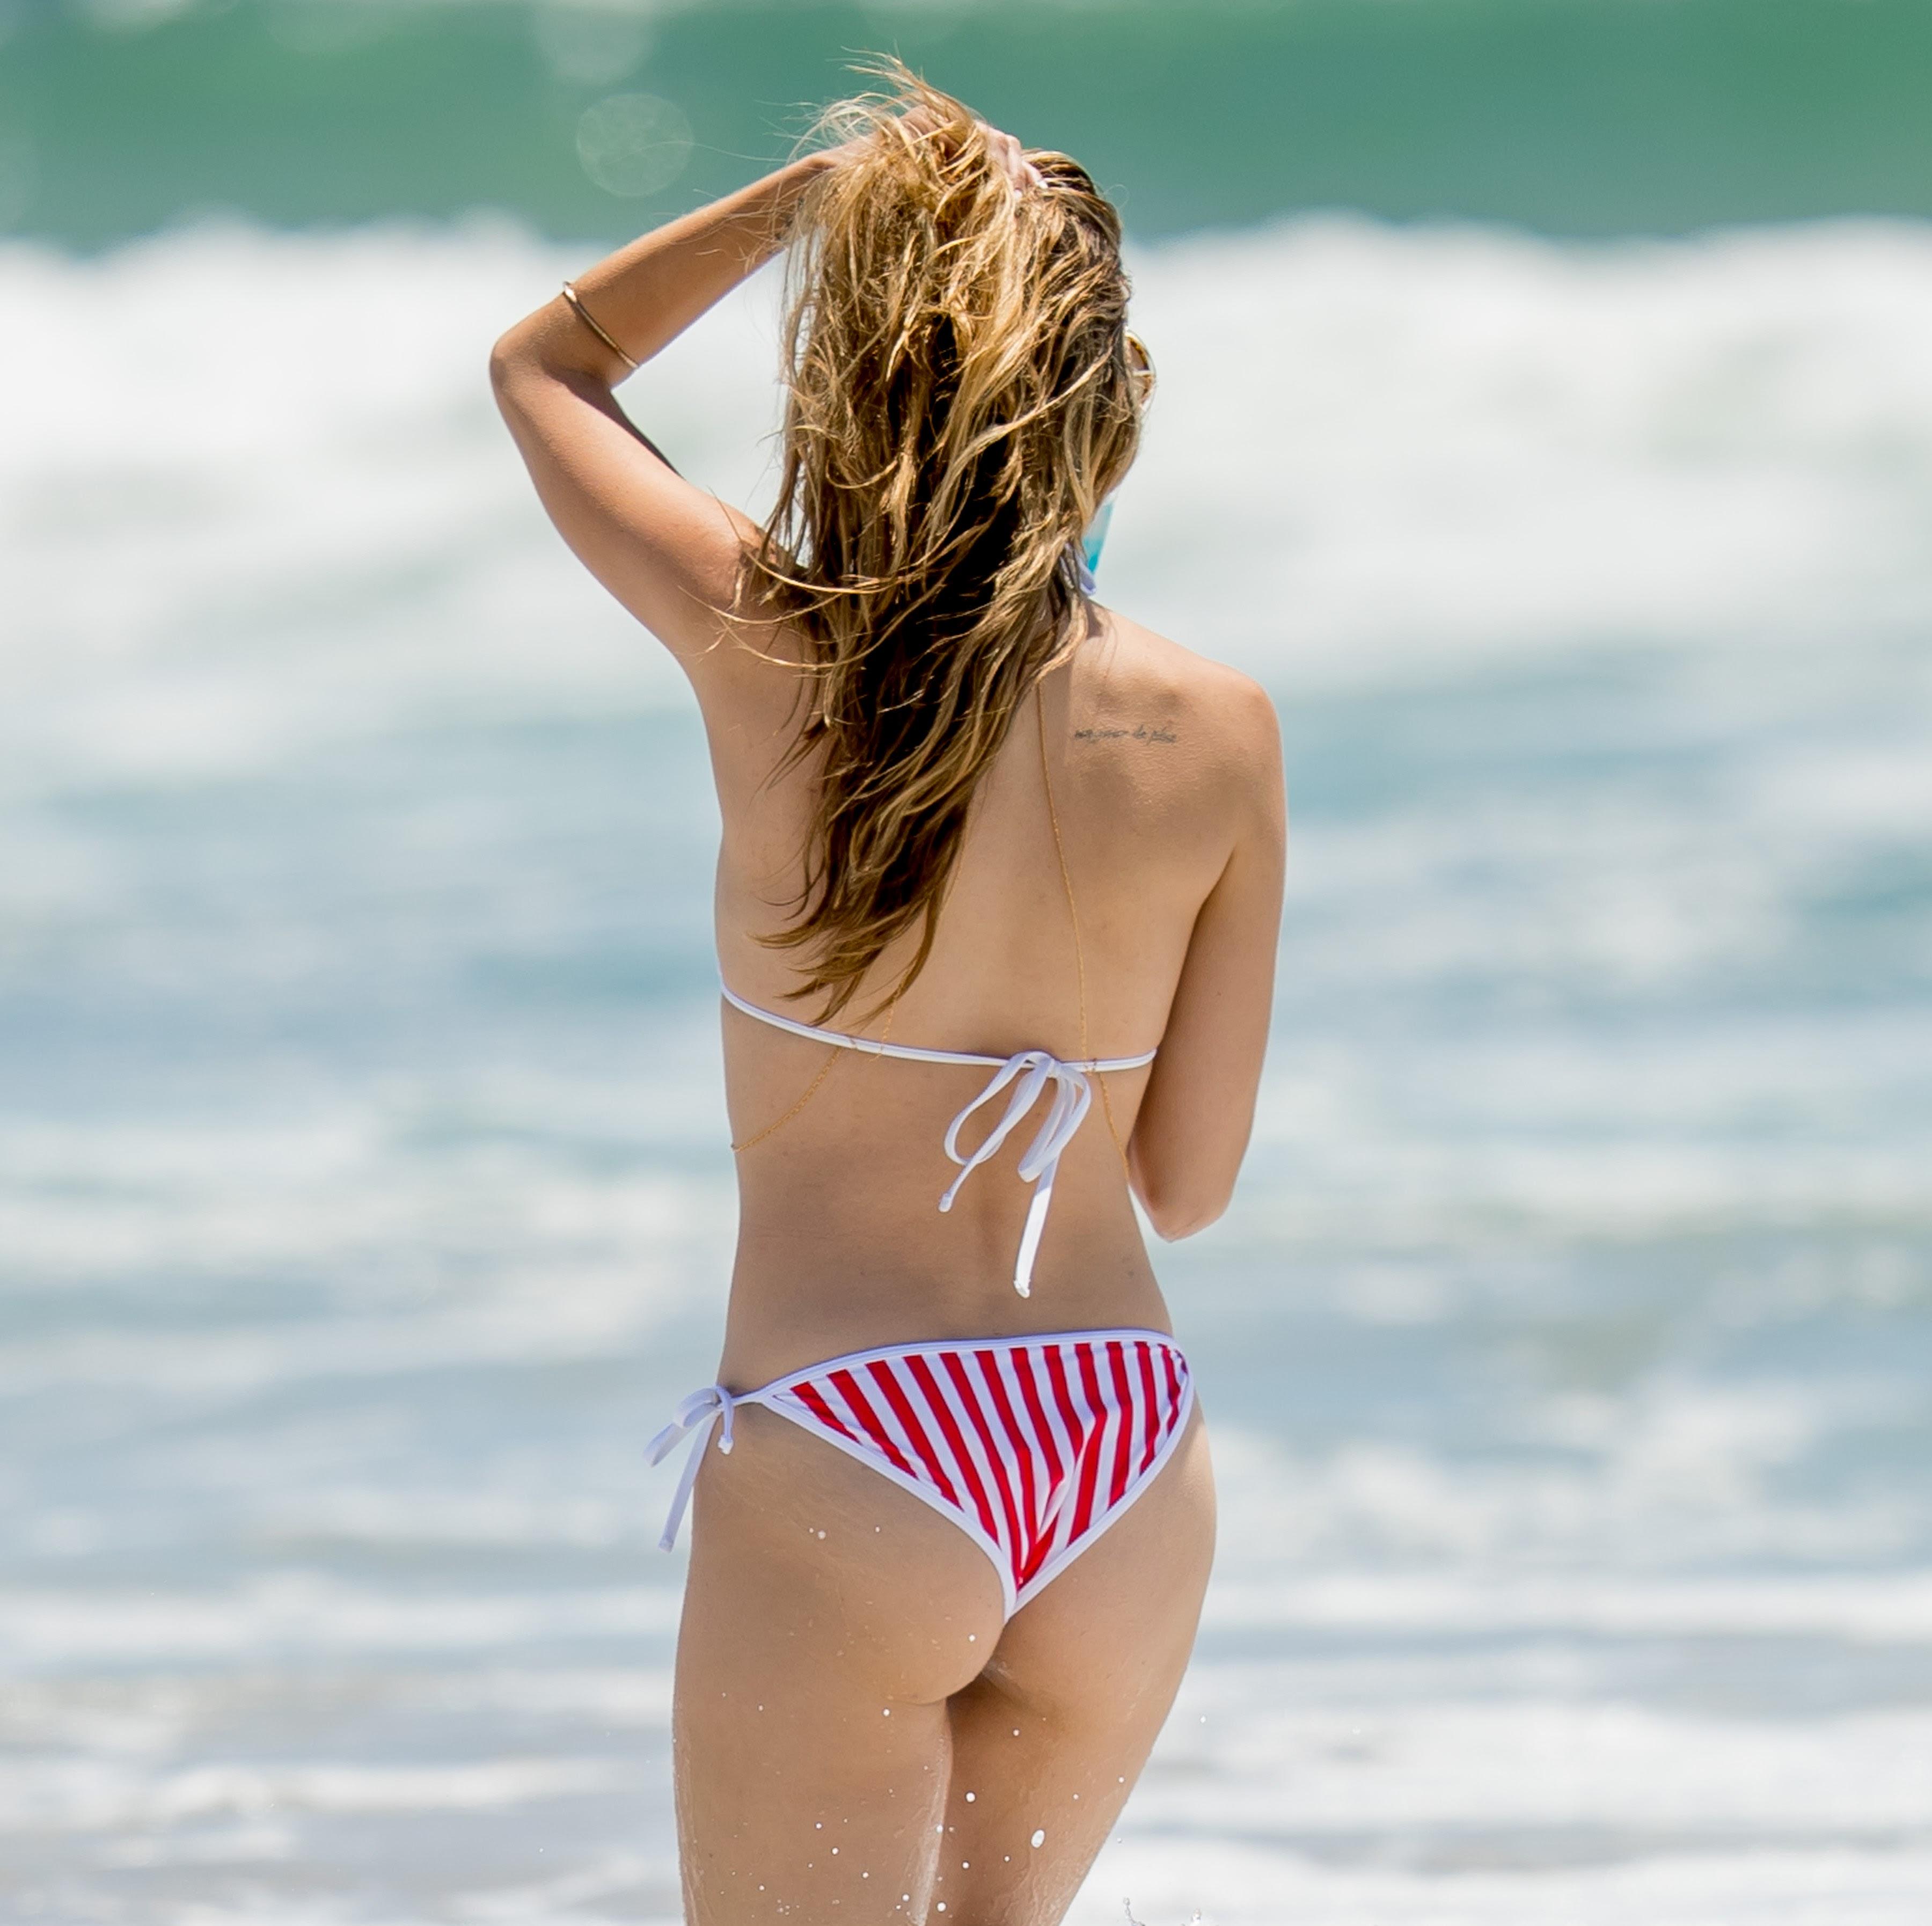 Celebrities magazine rachel mccord bikini for Rachel s palm beach